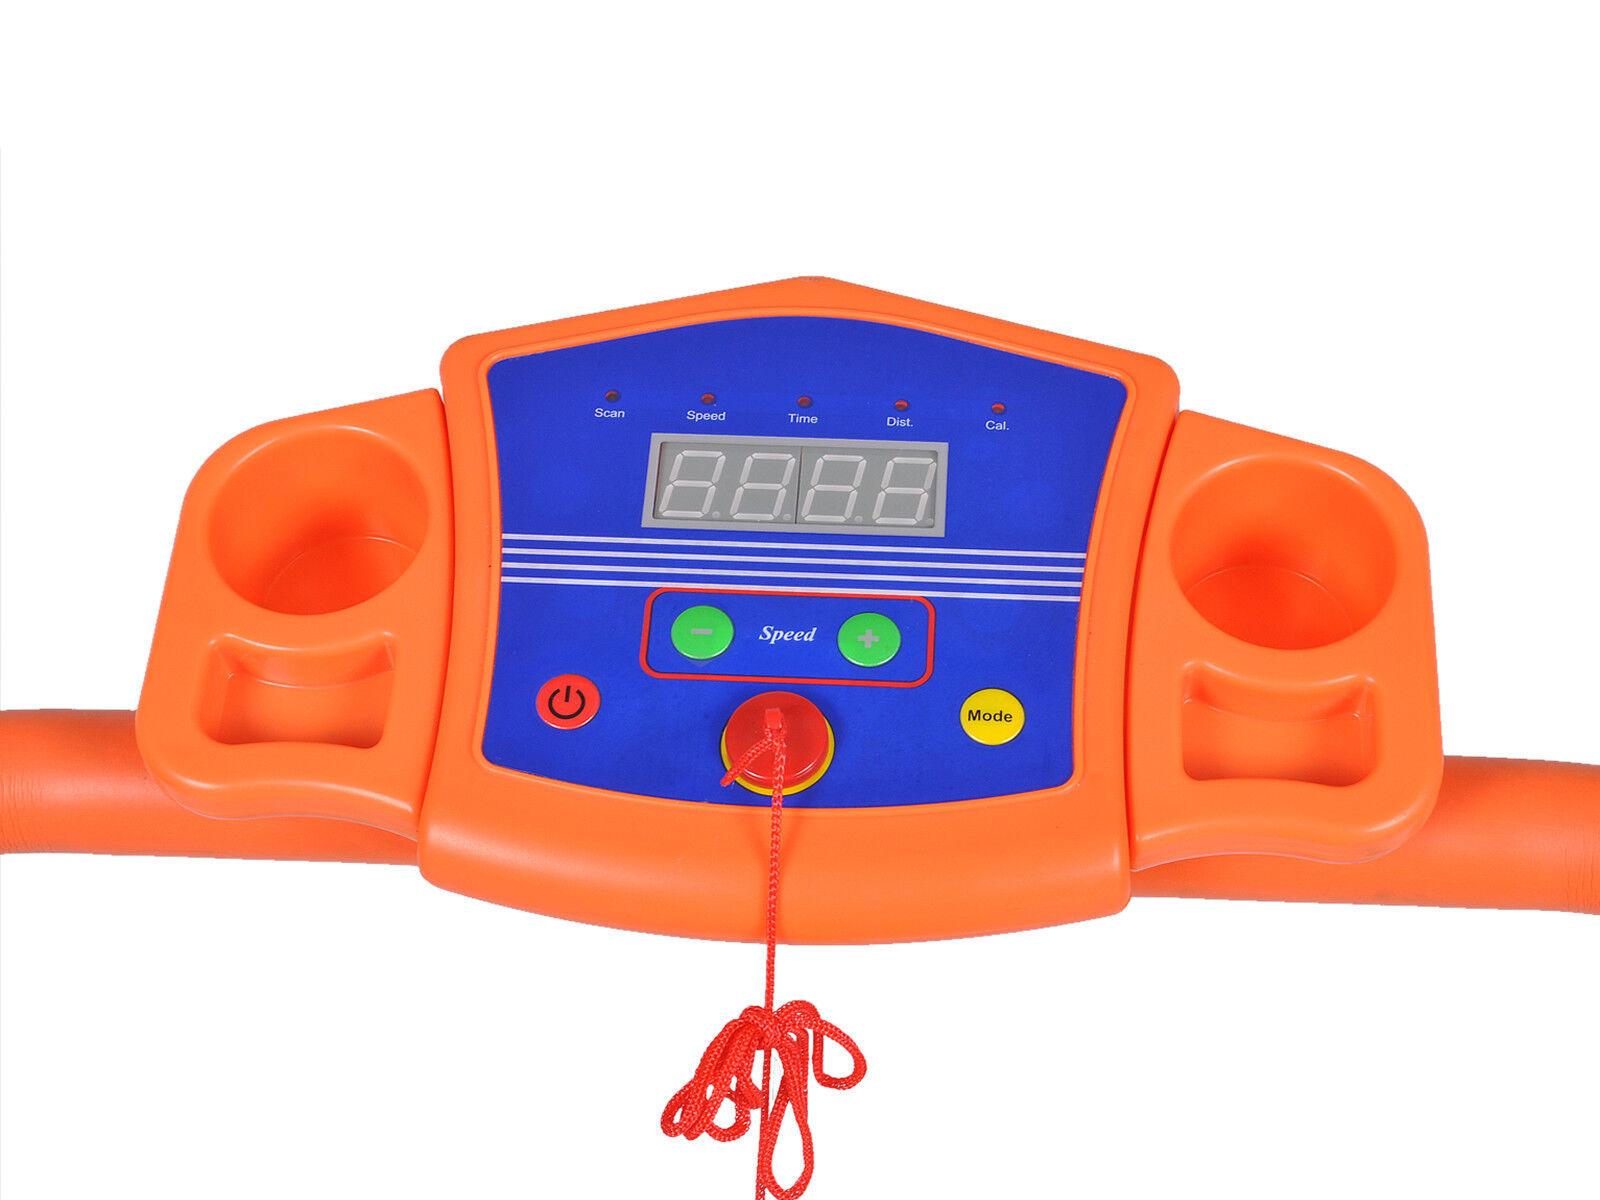 1100w folding electric treadmill portable motorized running fitness machine bk